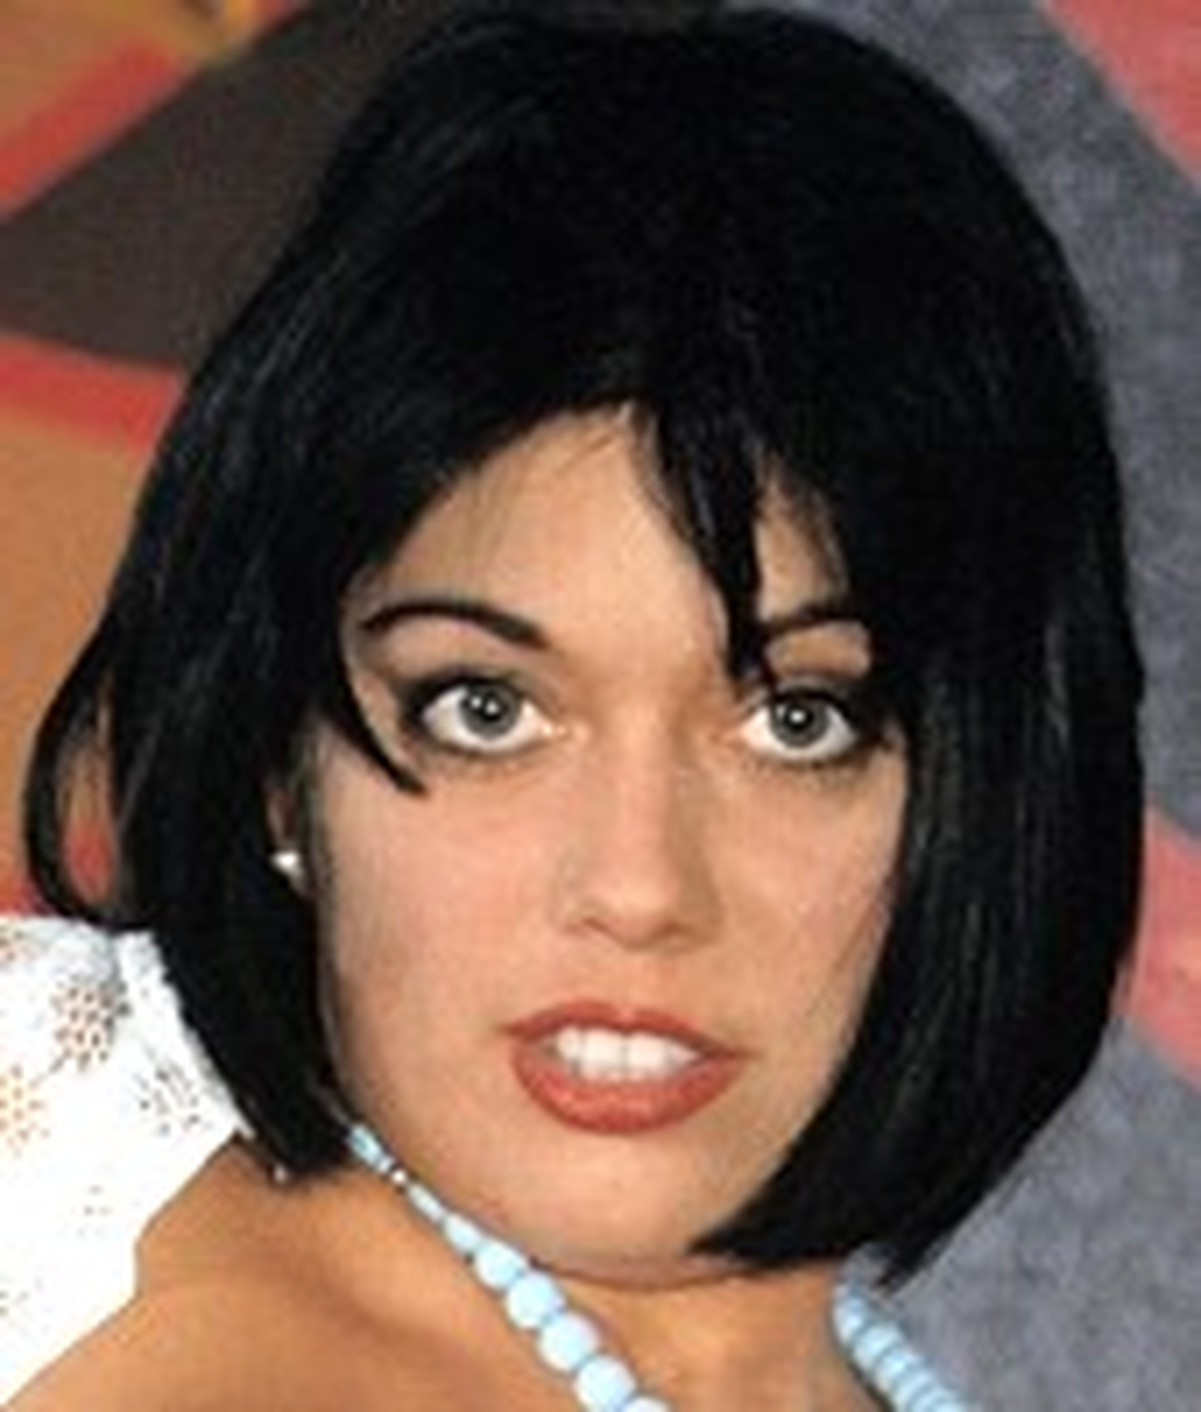 Rita Cardinale